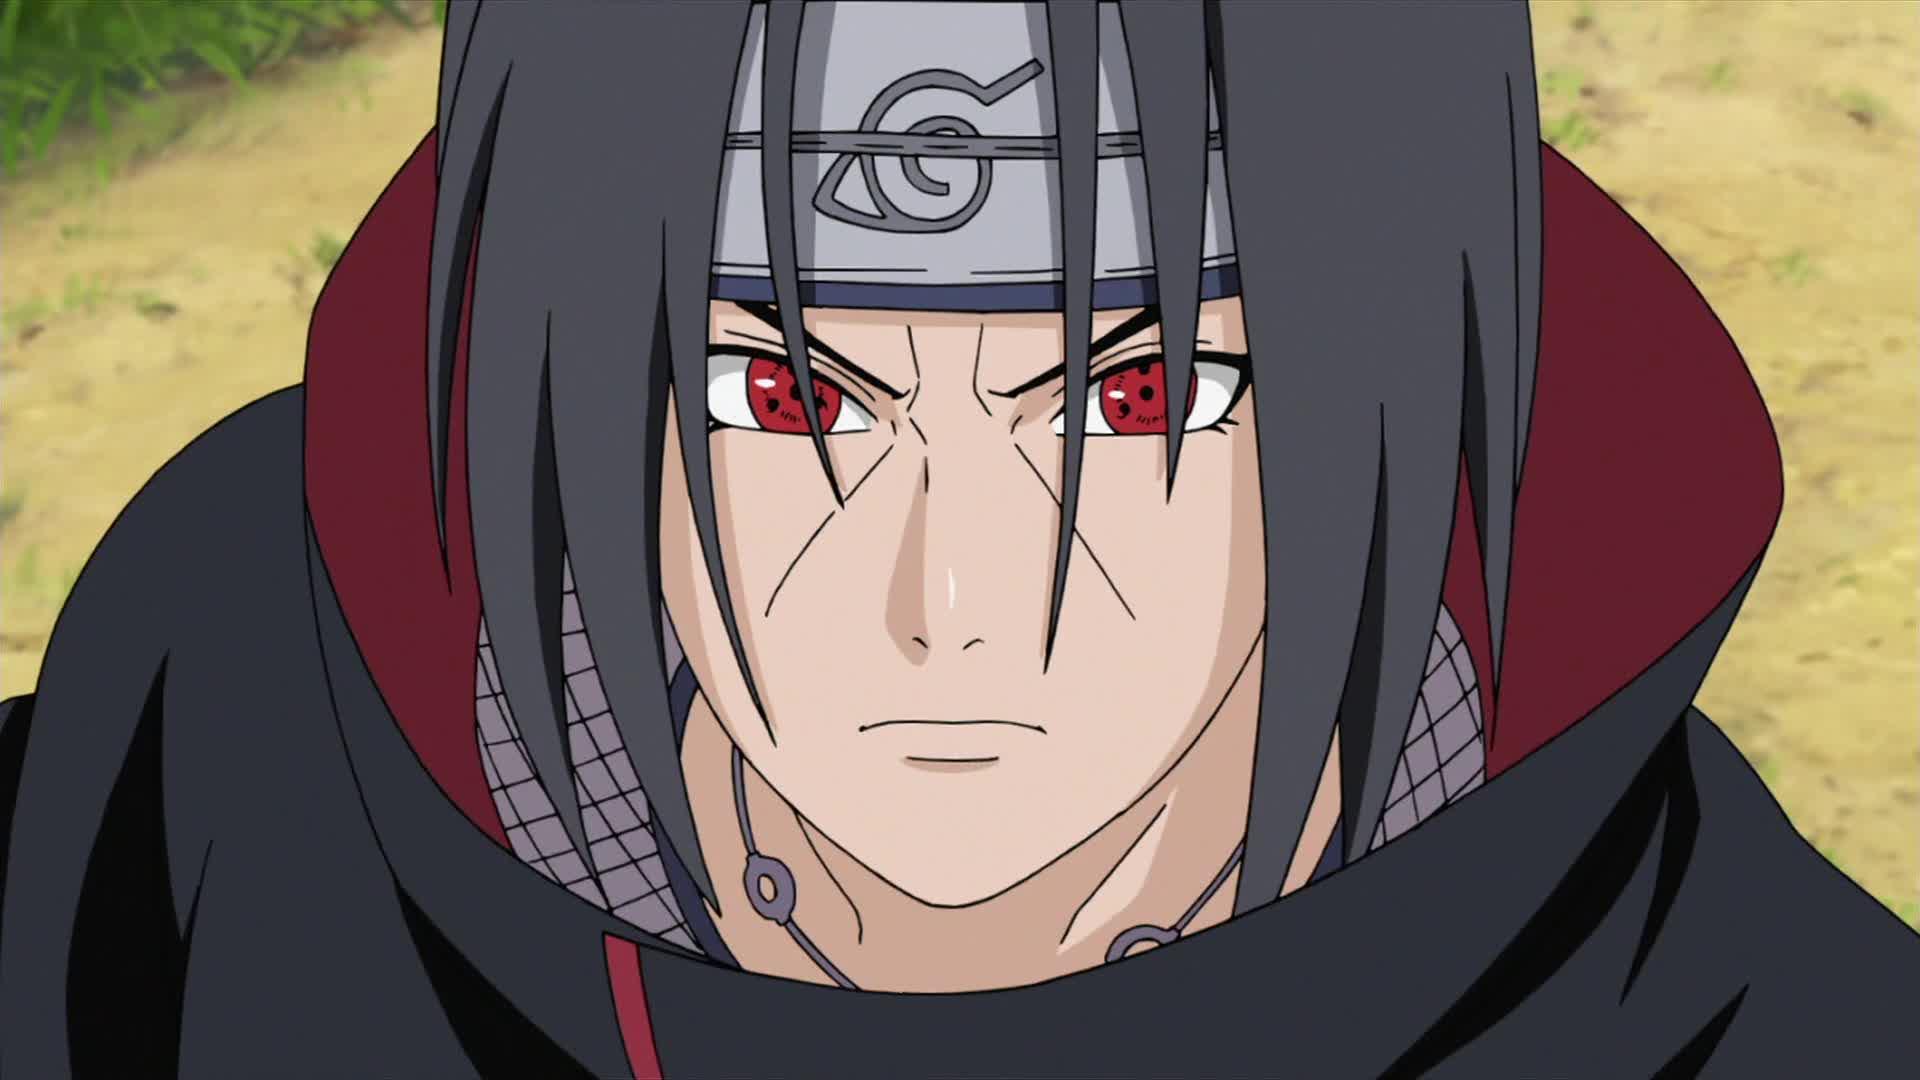 5 Shinobi Paling Menginspirasi di Anime Naruto 6